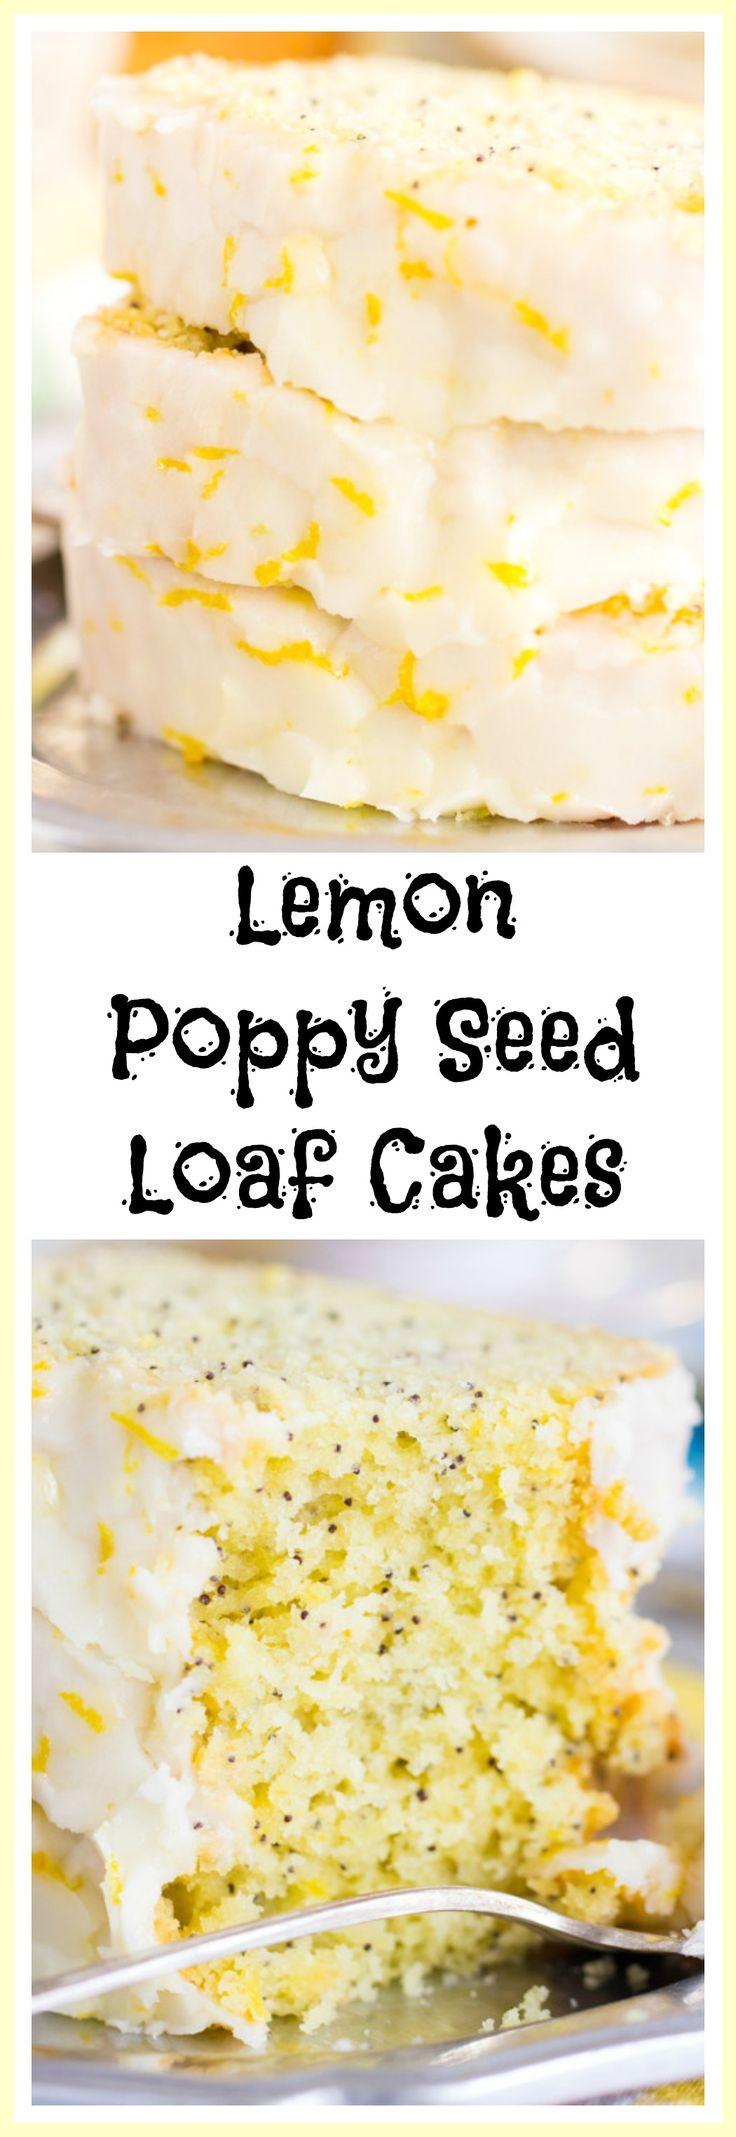 Lemon Poppy Seed Loaf Cake image pin